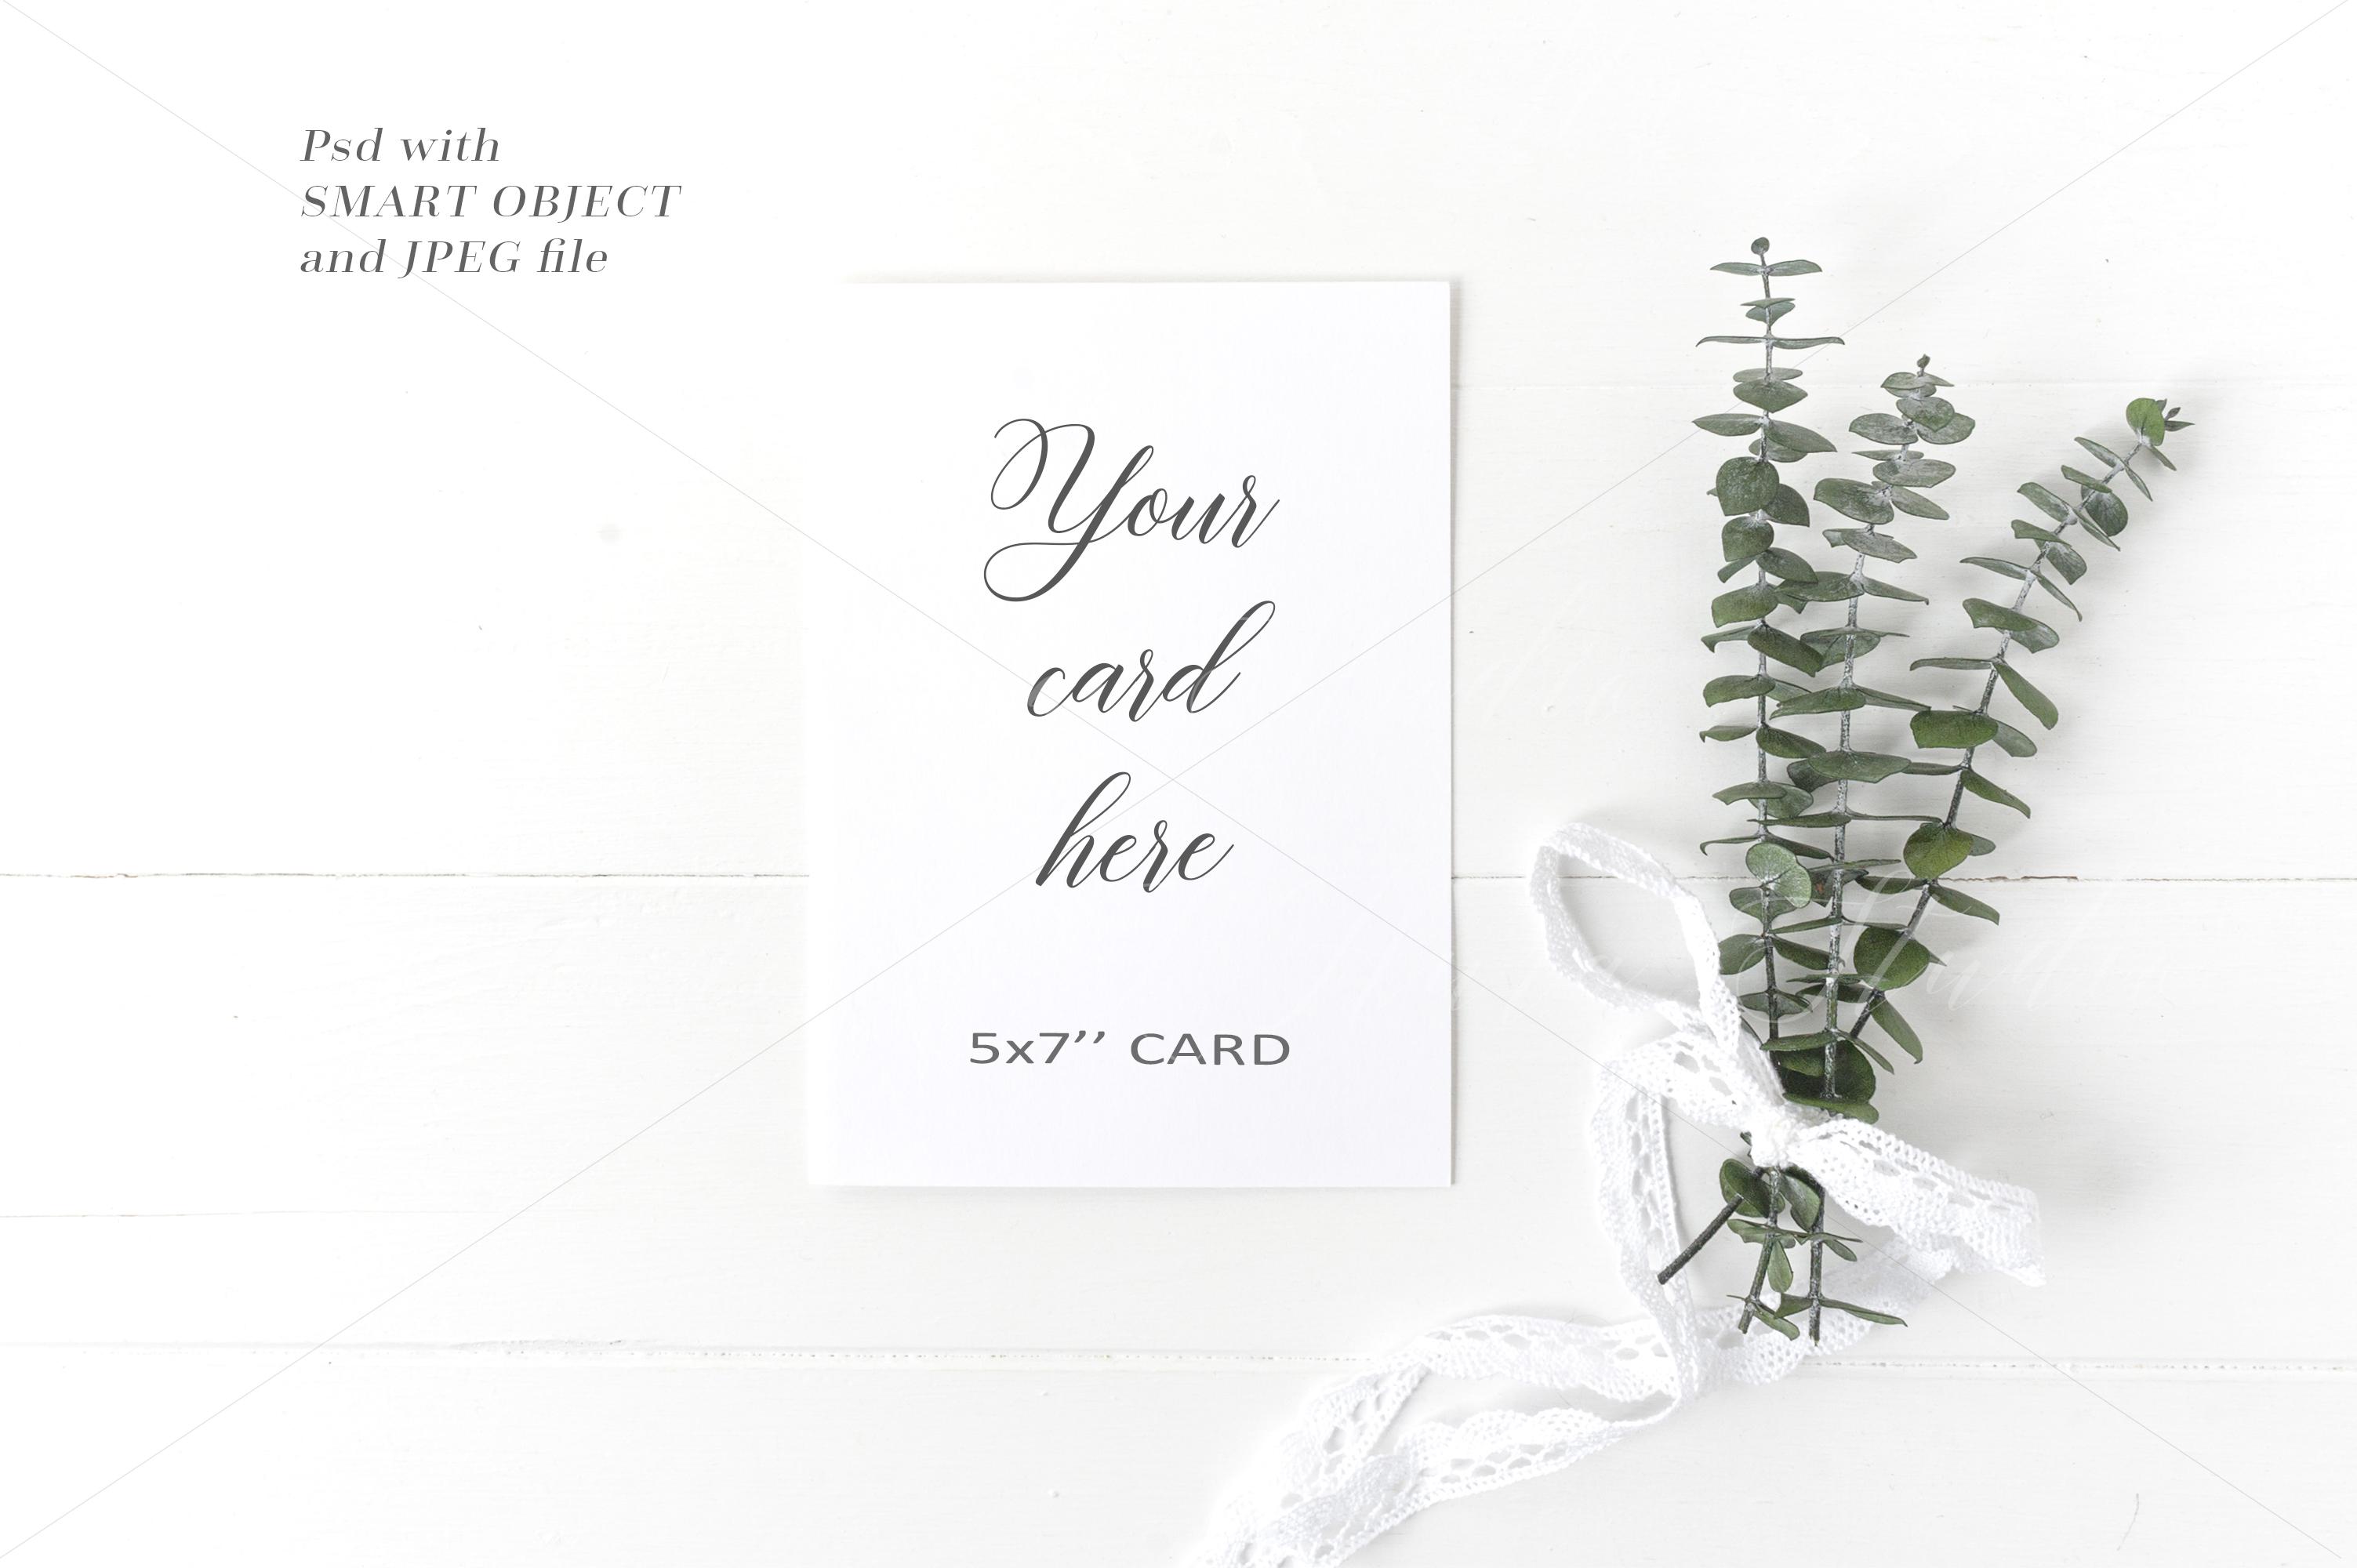 Wedding Card Mockup - crd228 example image 1